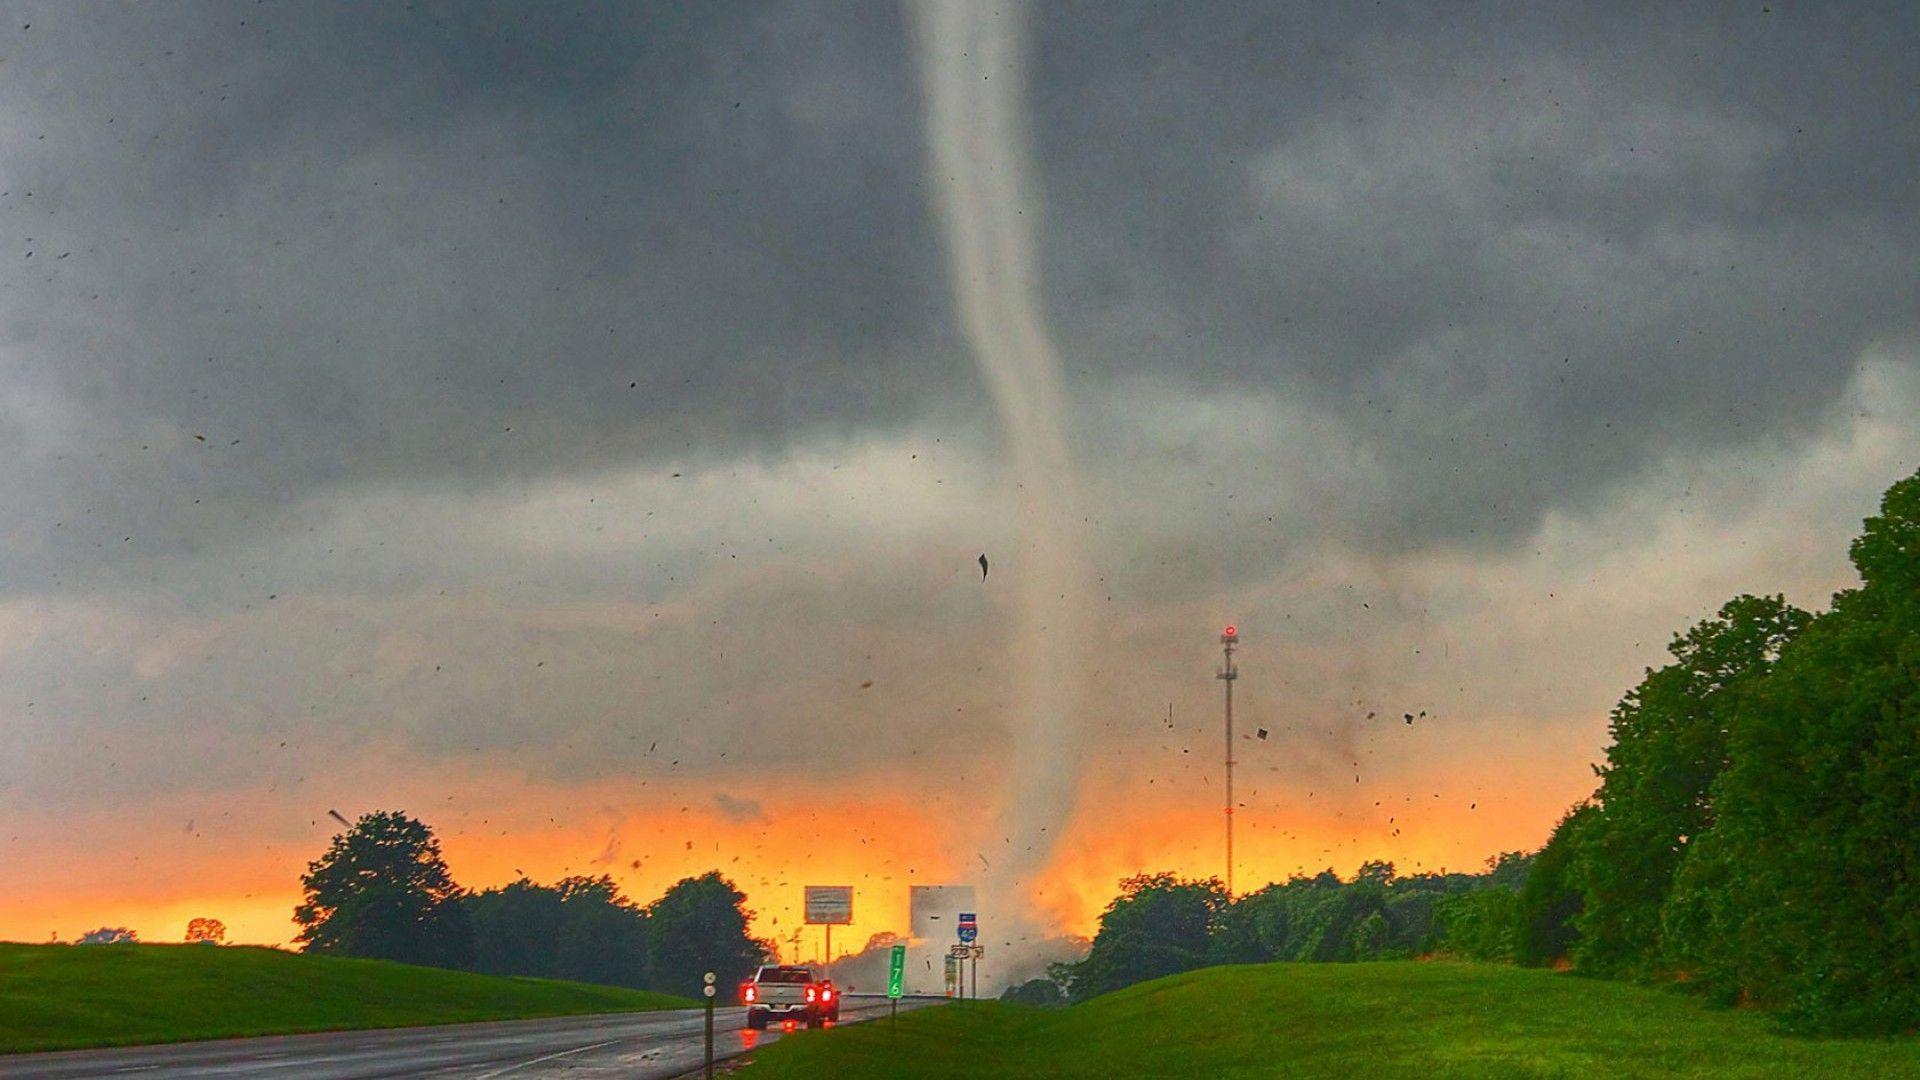 tornado wallpaper hd - photo #10